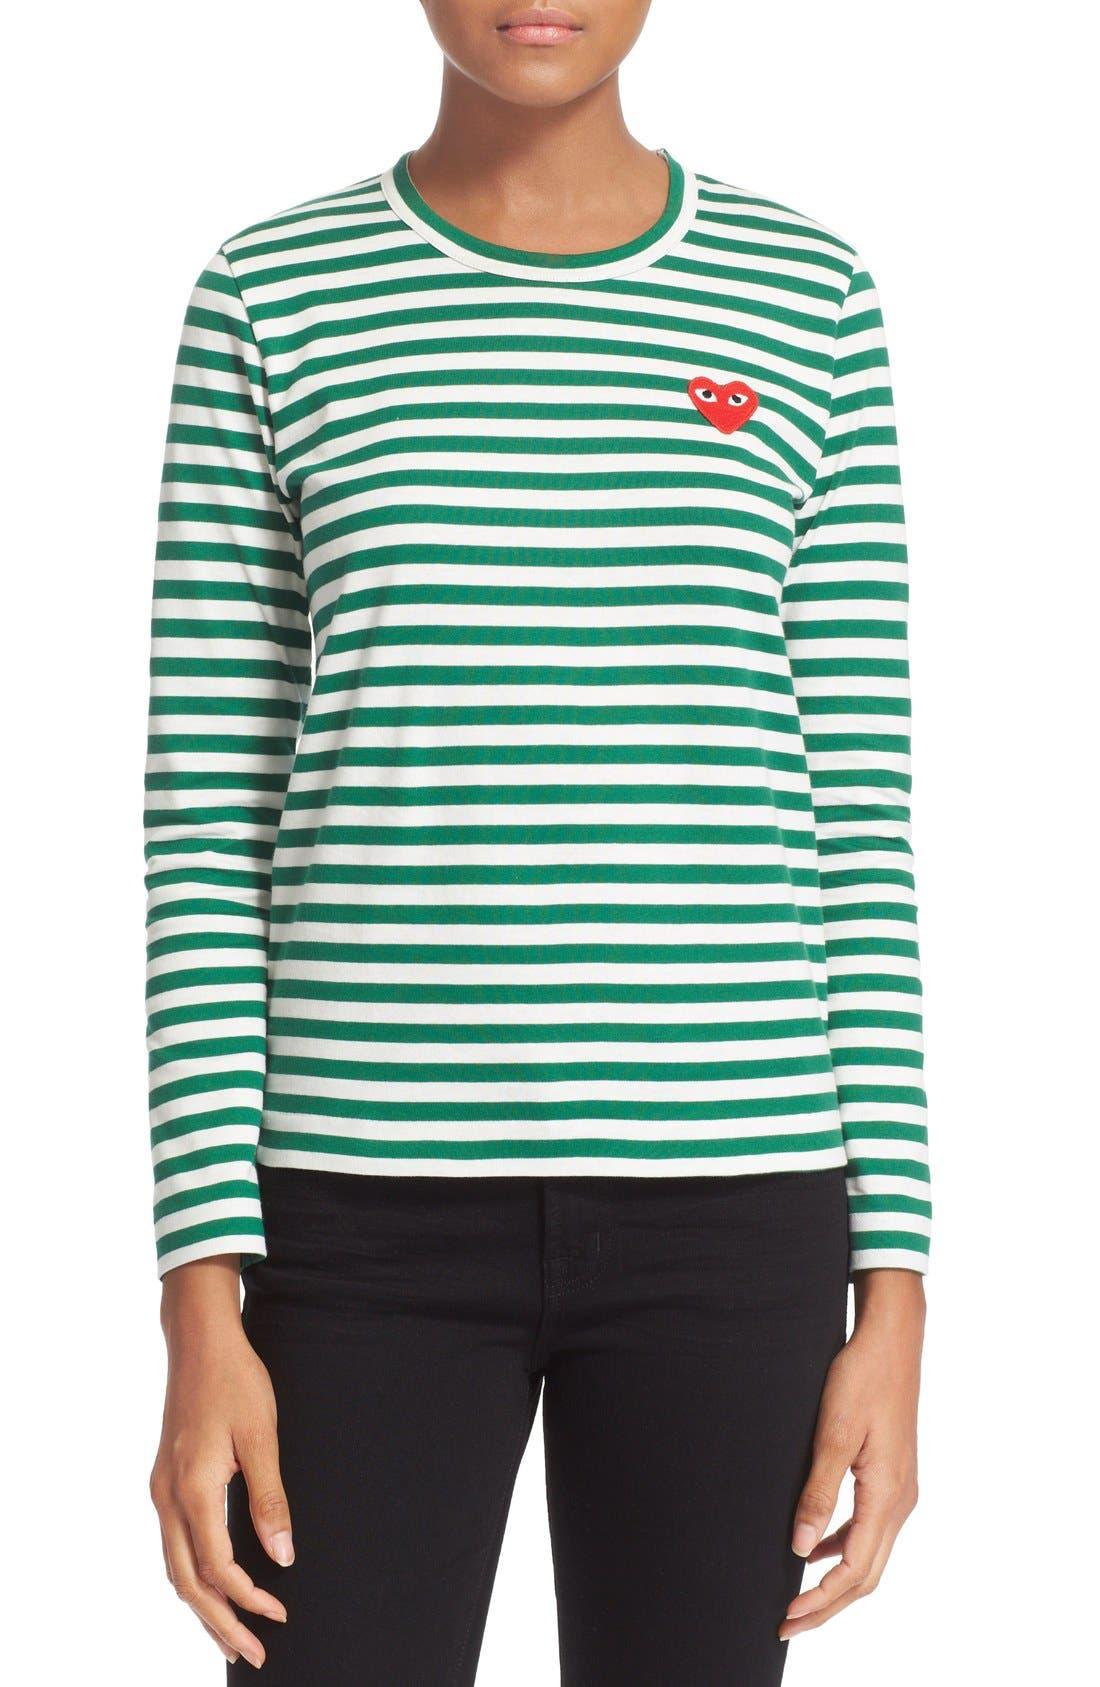 Alternate Image 1 Selected - Comme des Garçons PLAY Stripe Cotton Tee